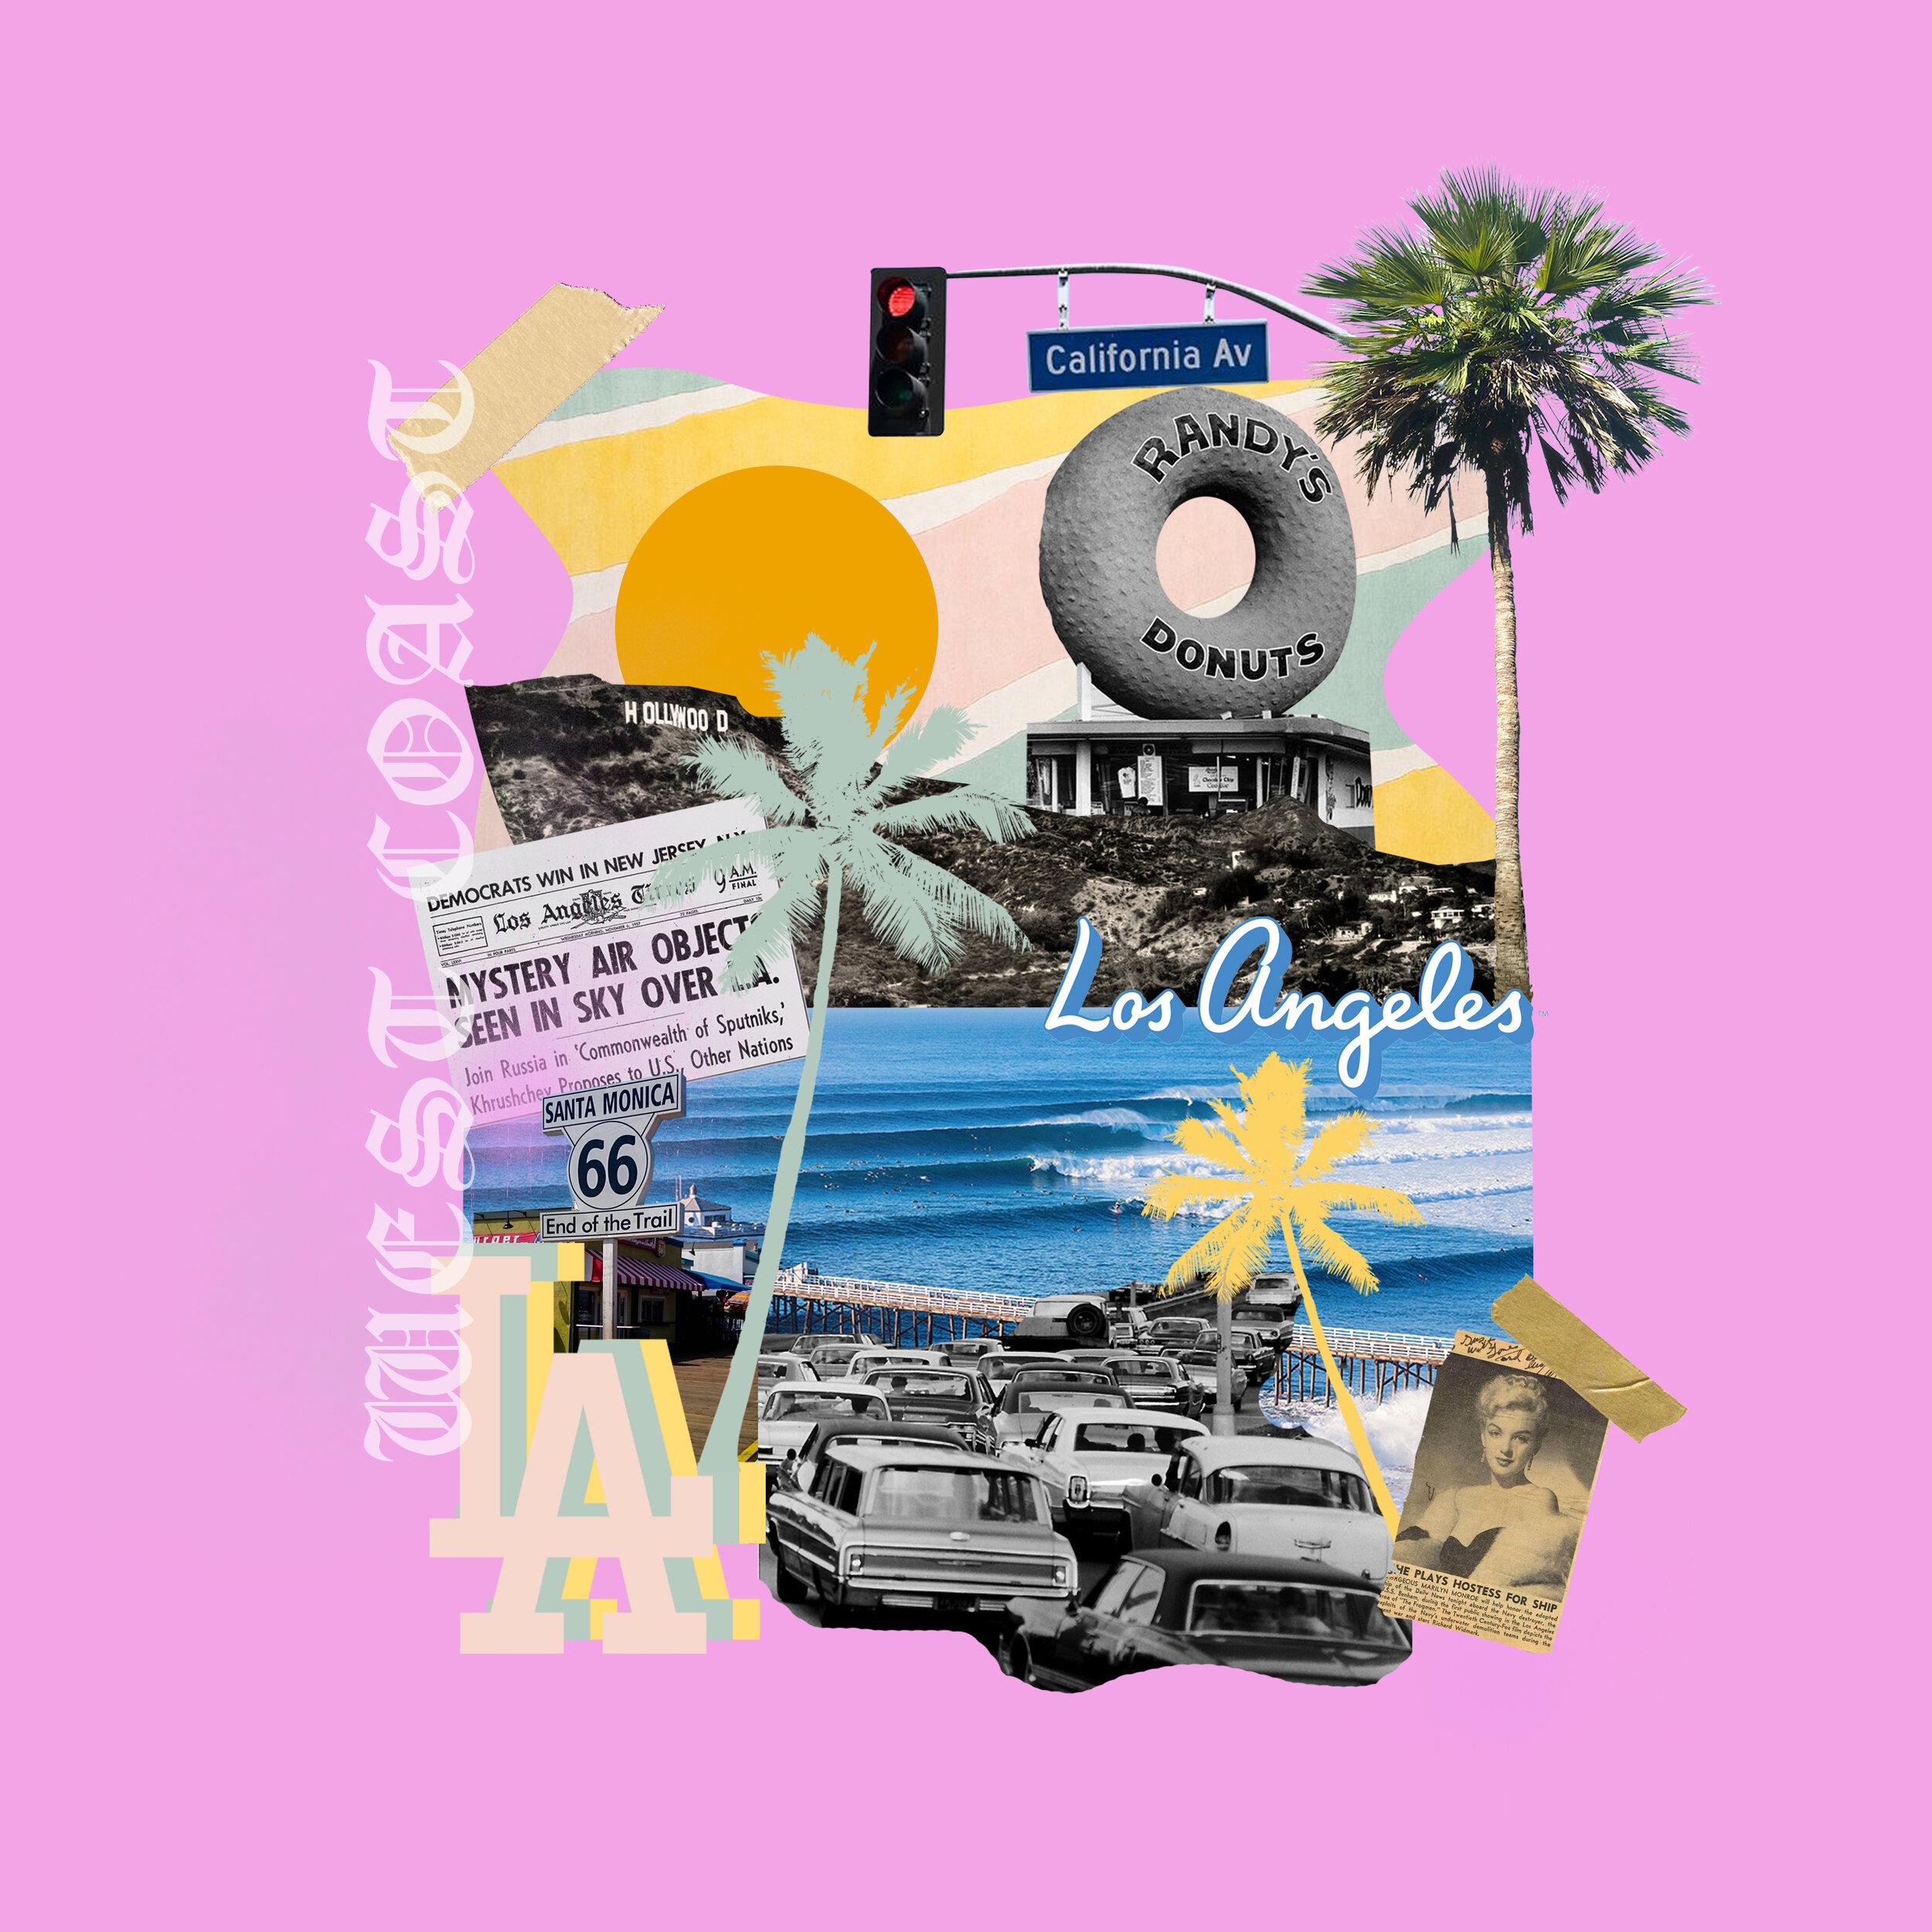 LA_collage.jpg